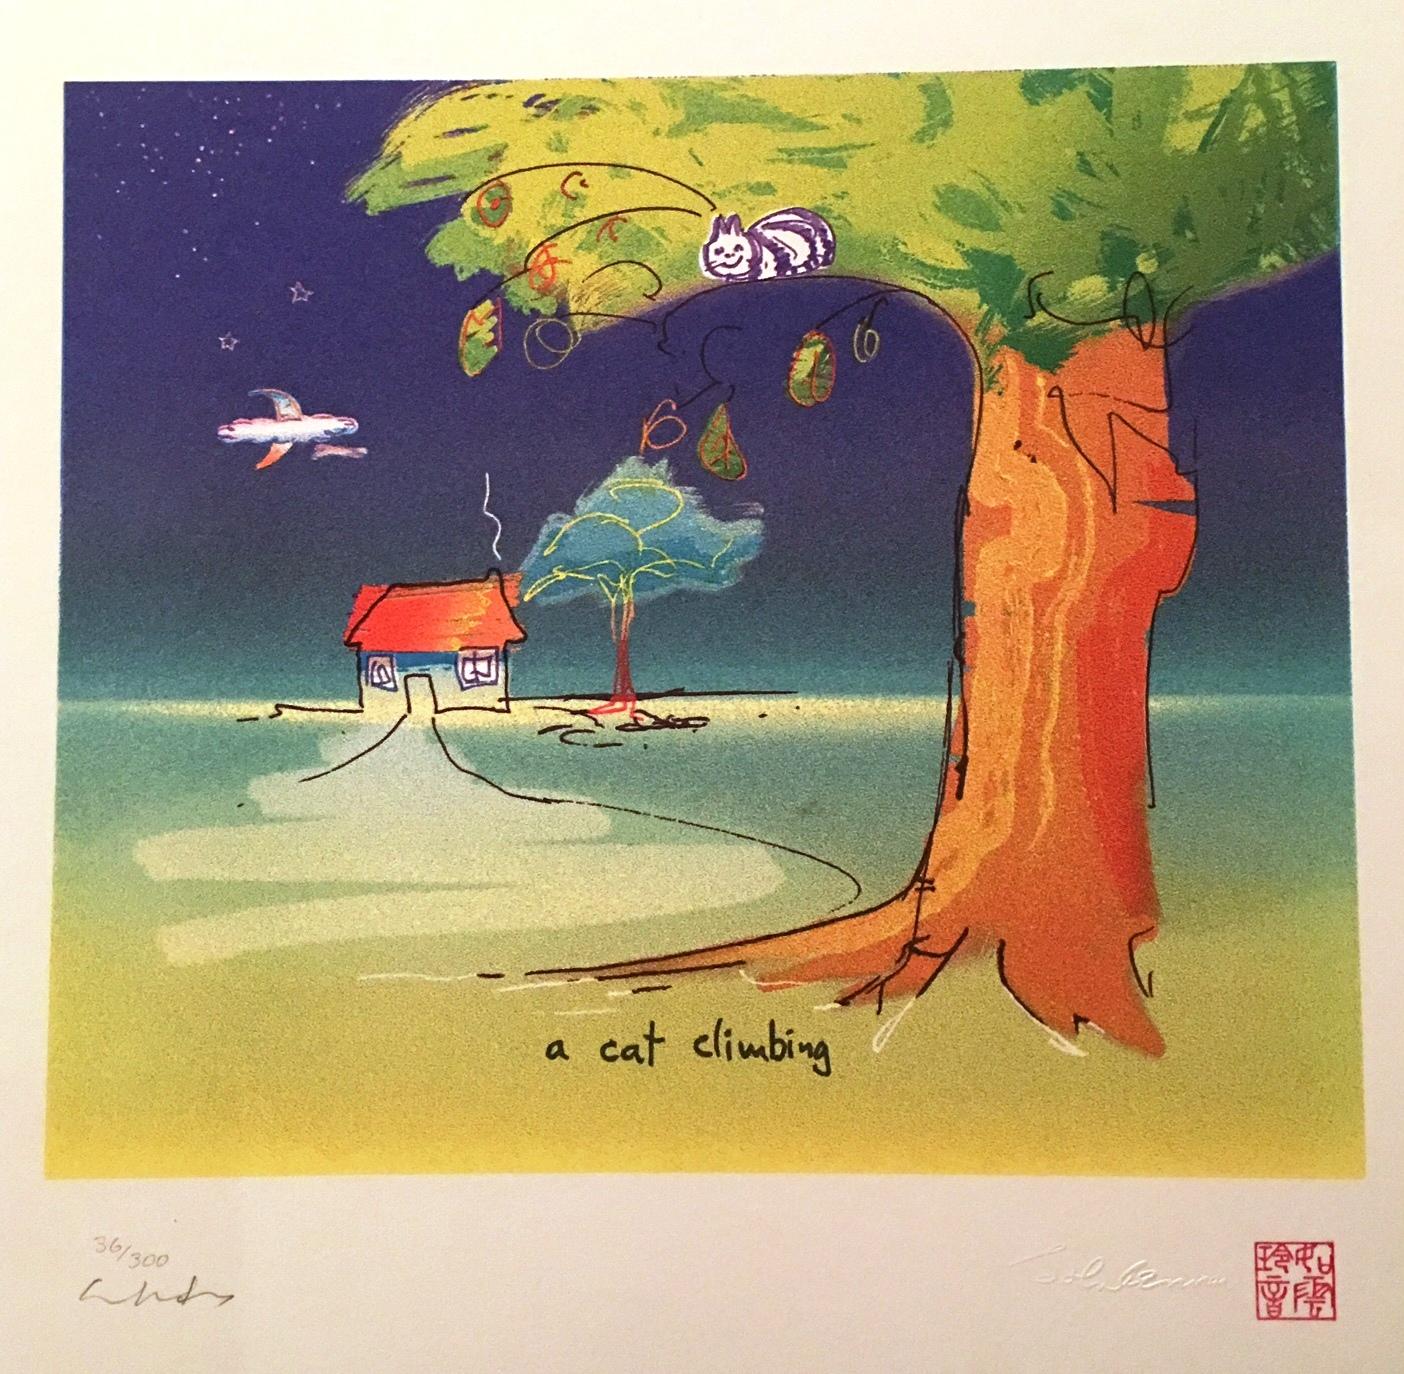 A Cat Climbing artwork by John Lennon - art listed for sale on Artplode